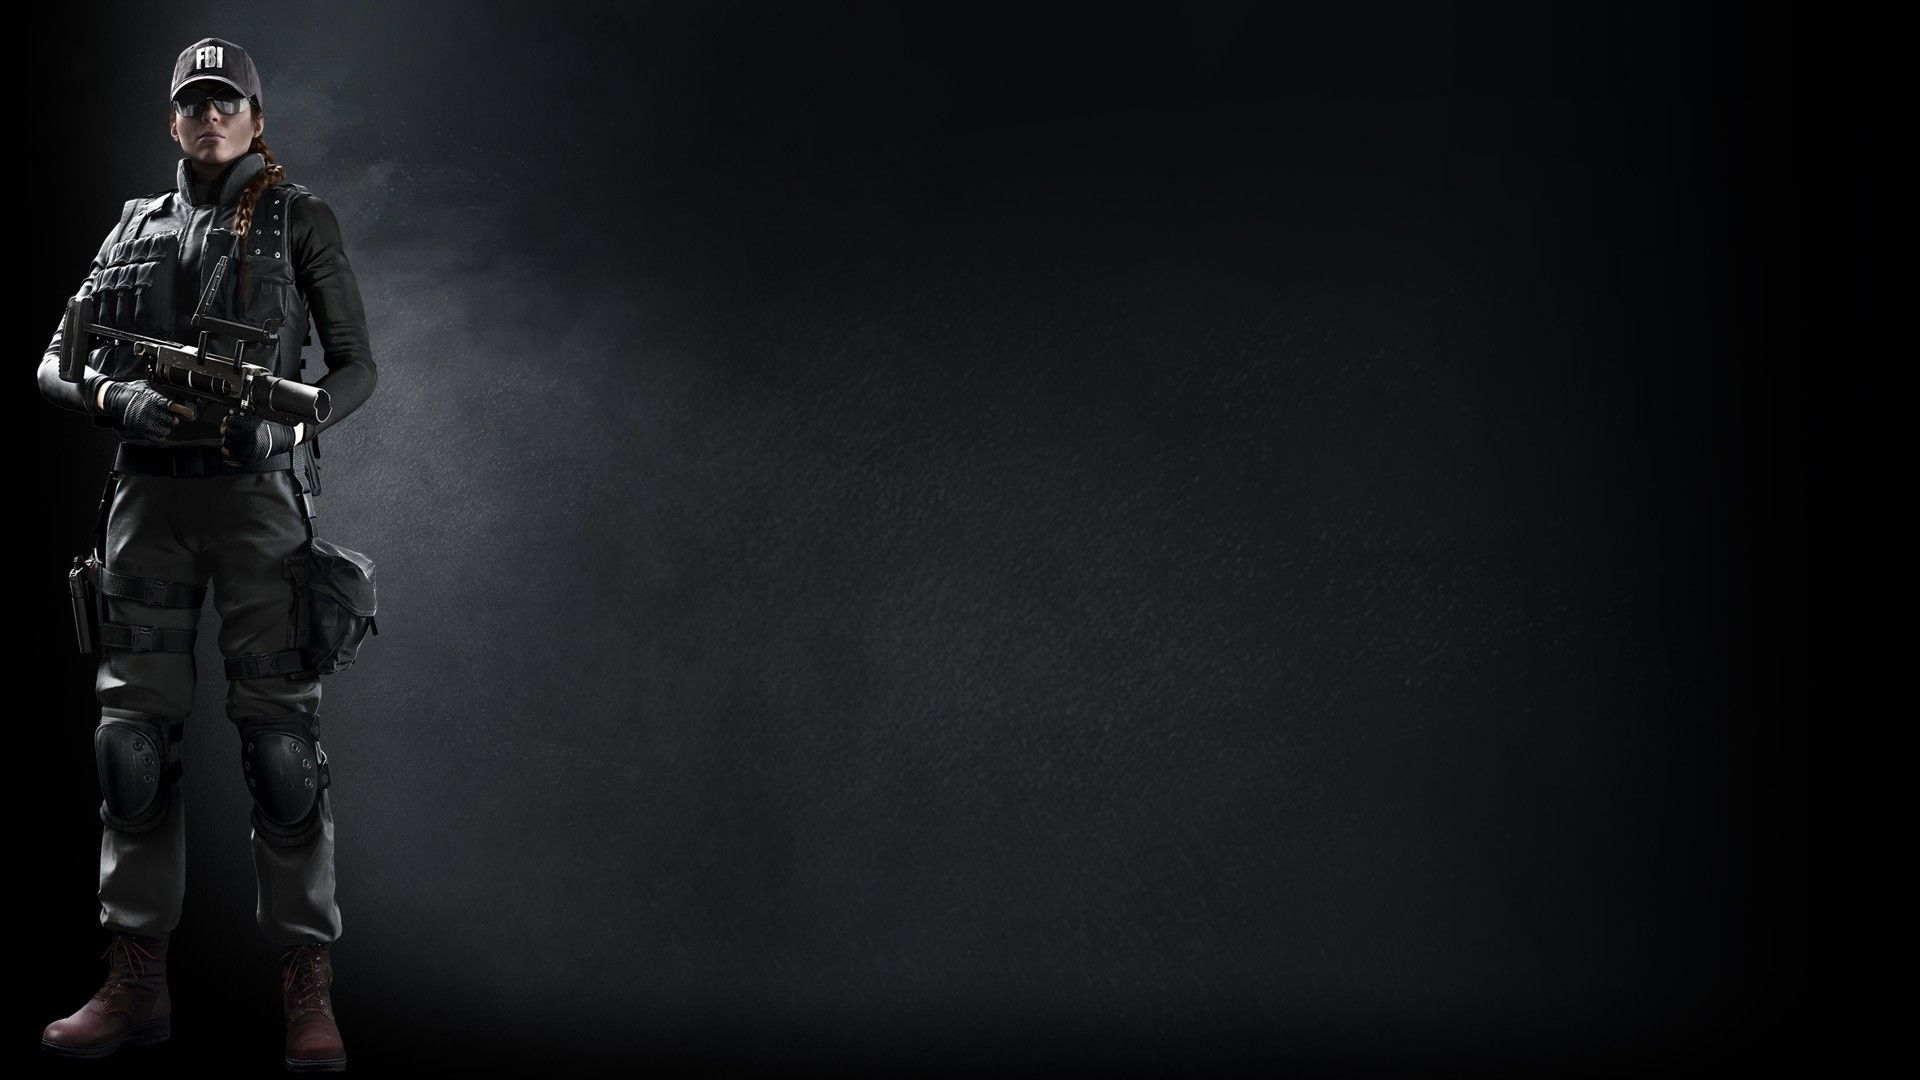 Tom Clancys Rainbow Six Siege 4K Wallpapers Wallpaper Cave